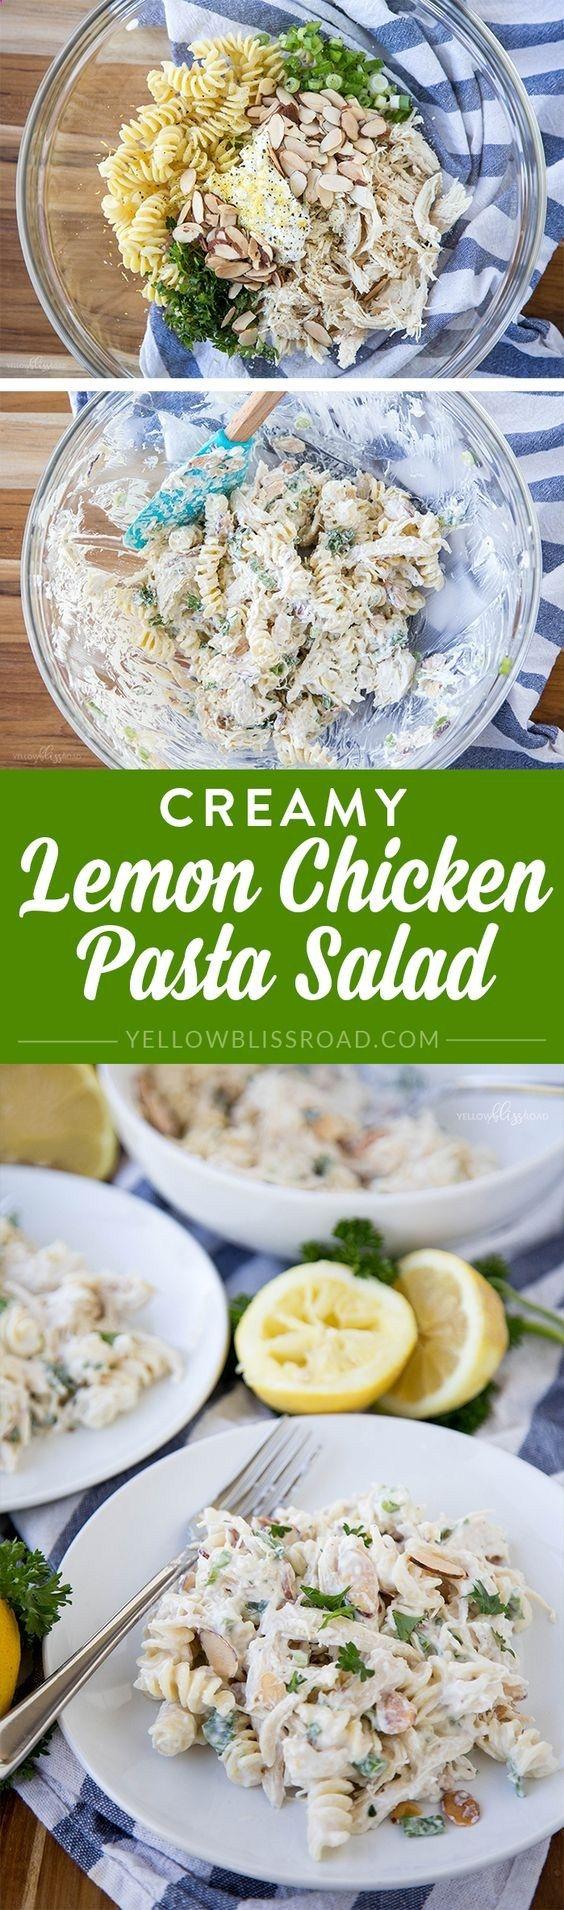 Creamy Lemon Chicken Pasta Salad - Chicken Salad with Pasta and a tangy, creamy lemon and Greek yogurt dressing.